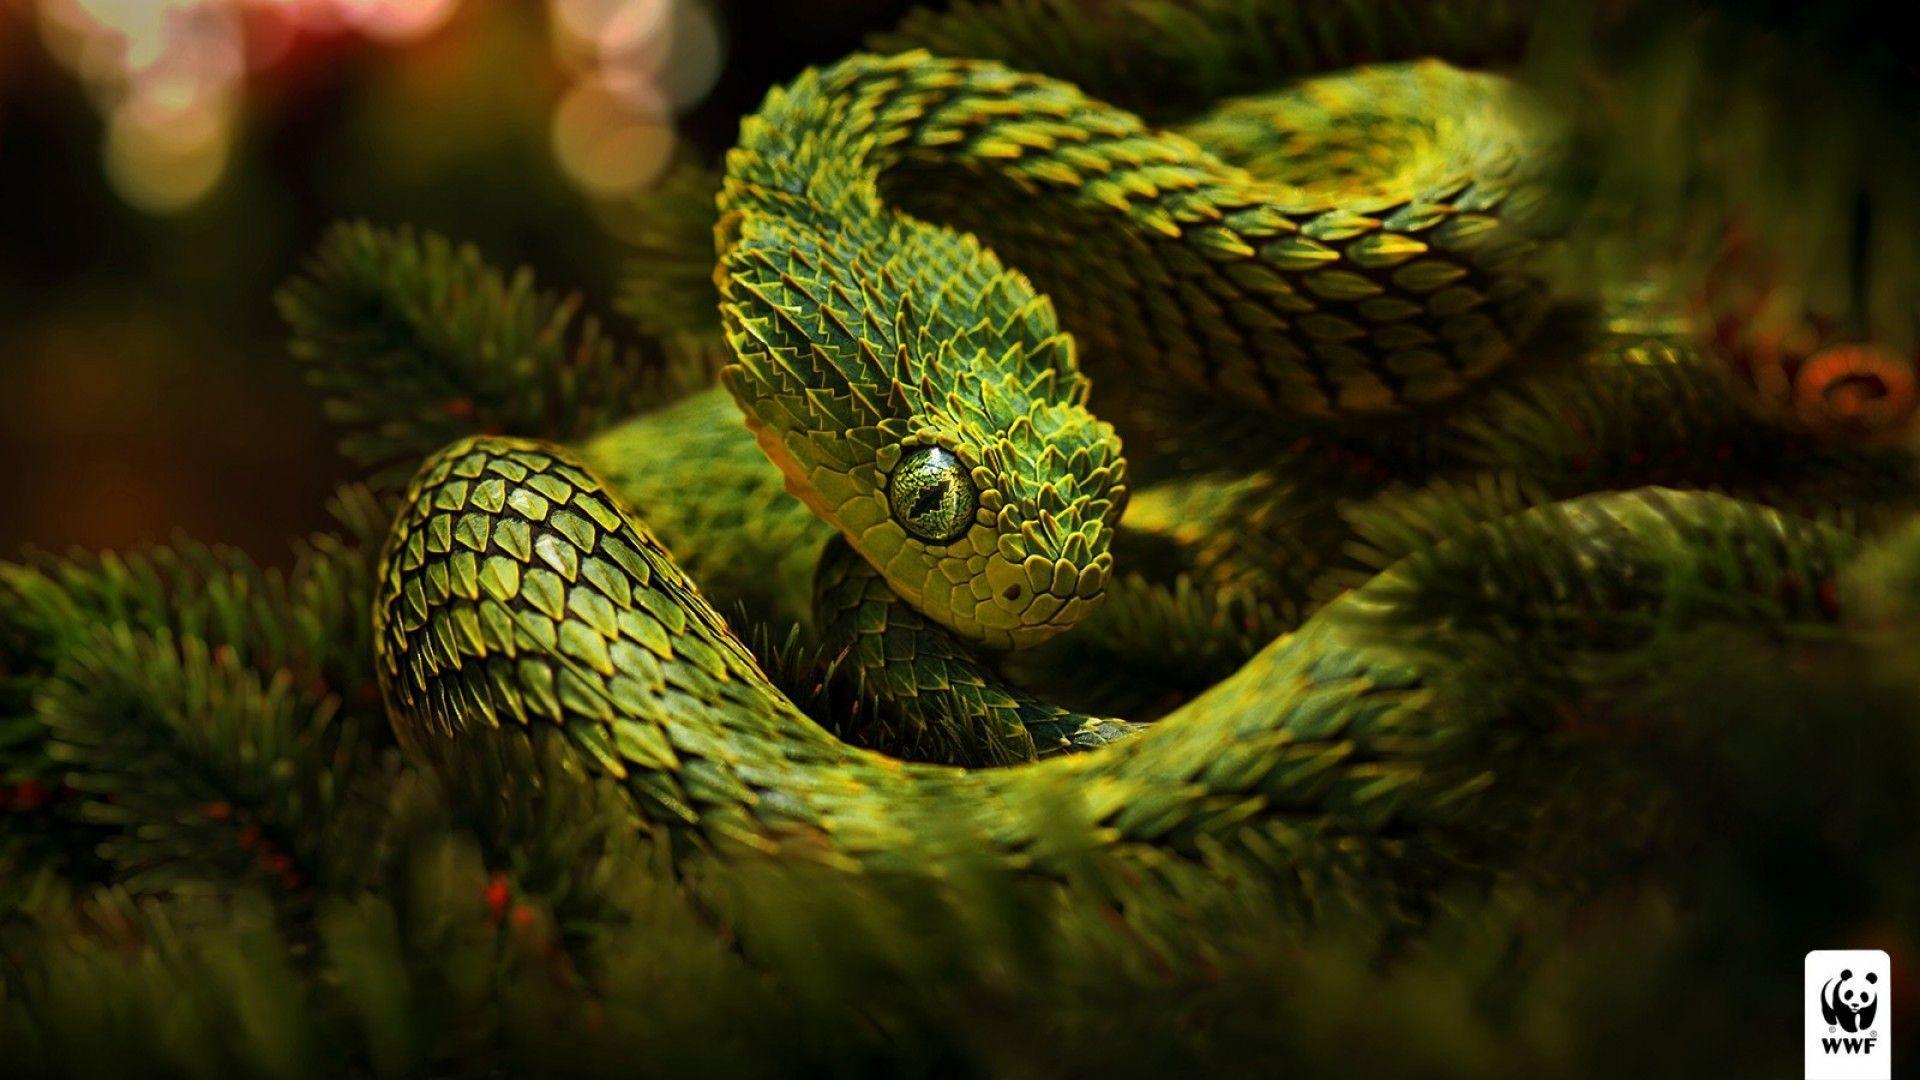 Viper Snake Hd Wallpapers Wallpaper Cave